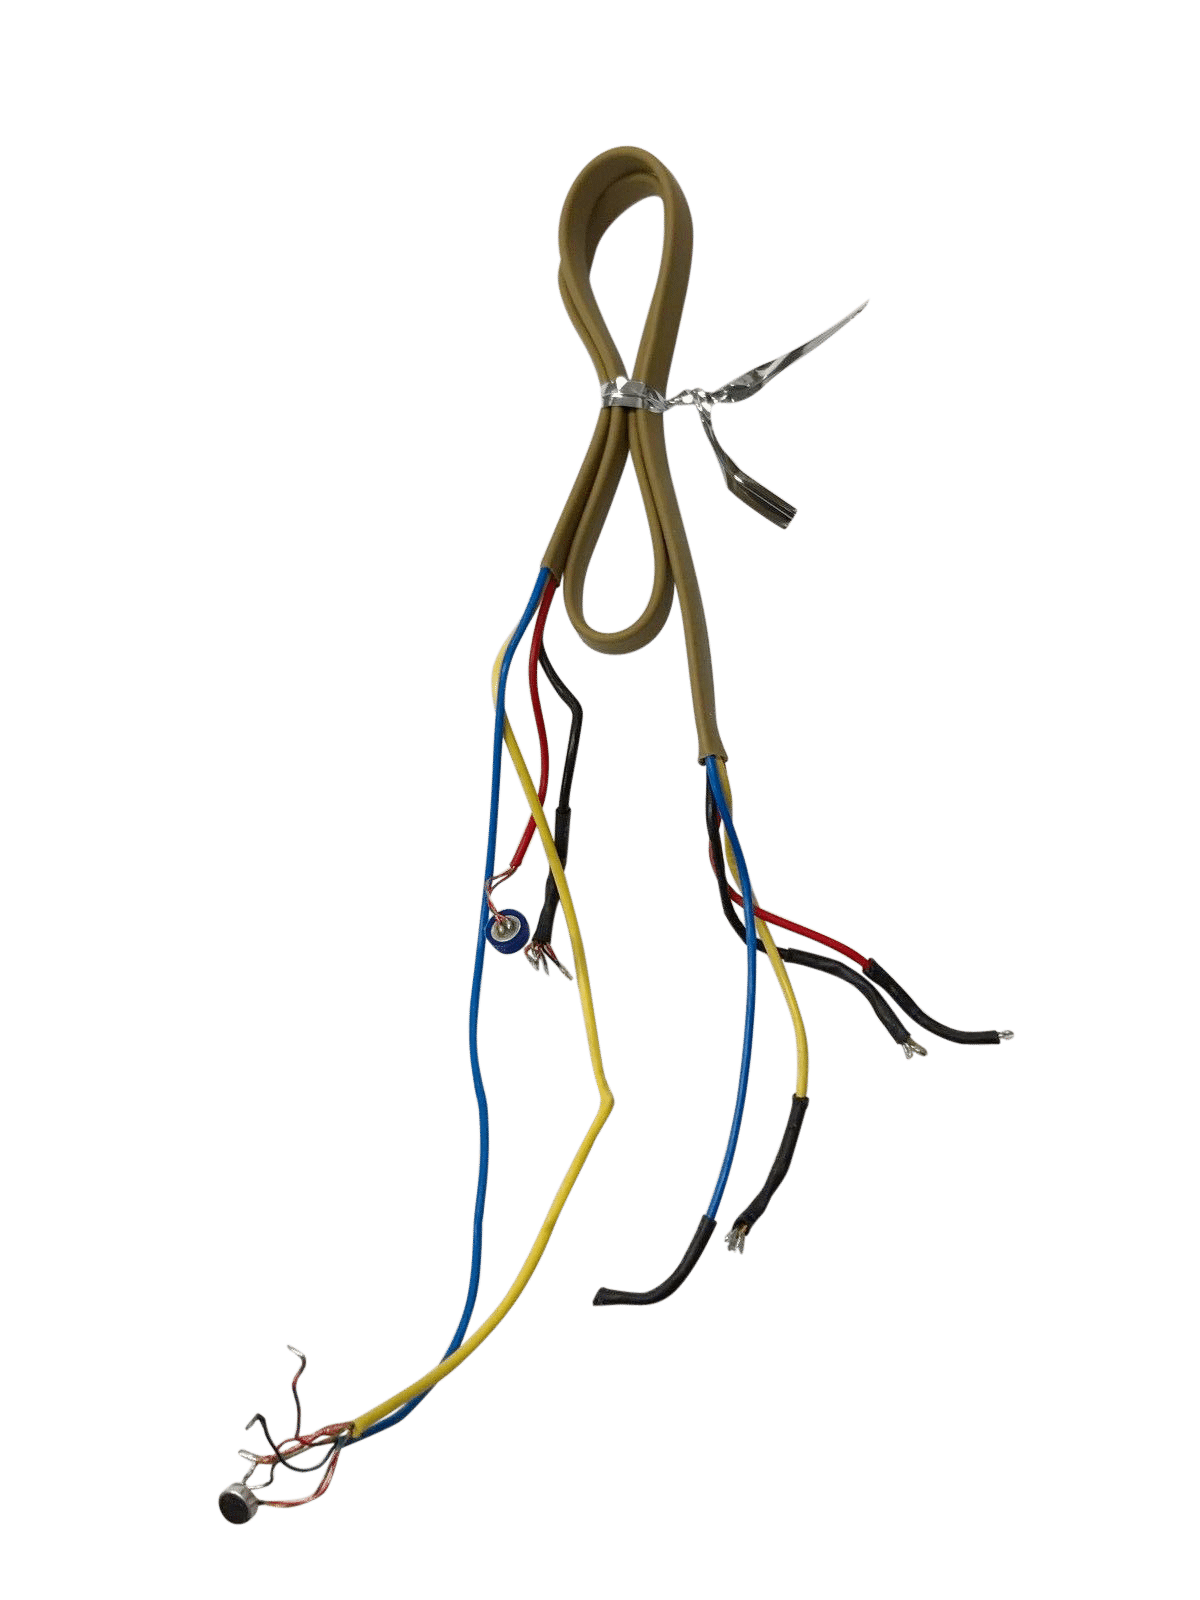 studio 2 wireless gold internal wire